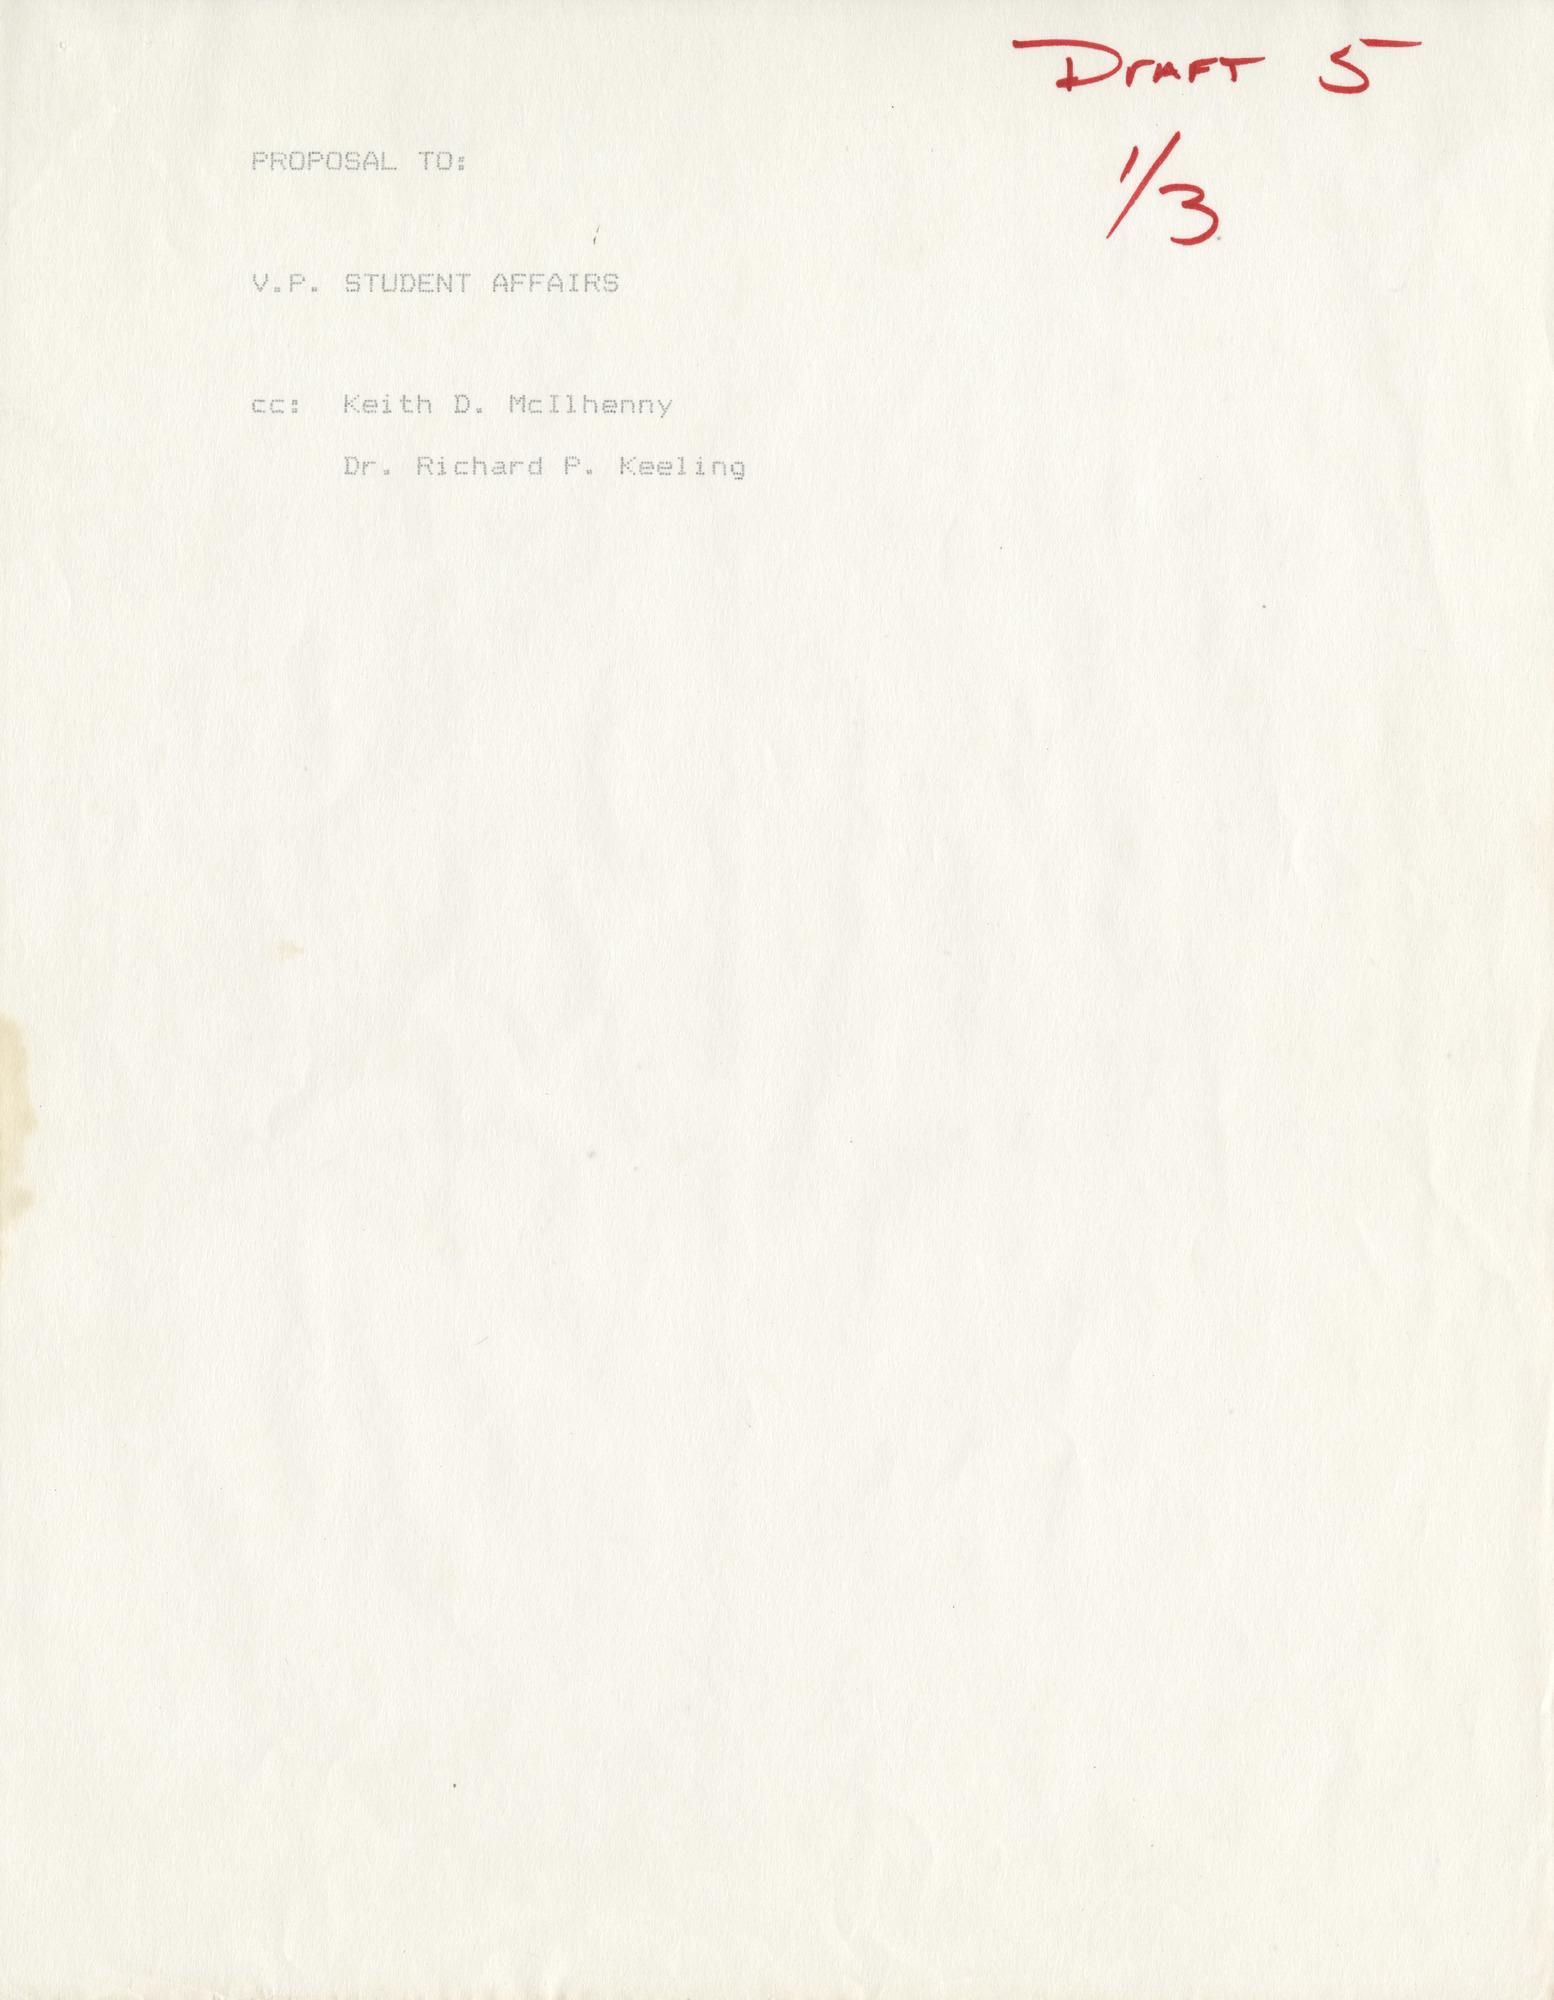 Ms2014-010_WeberMark_ProposalDraftforStaffPosition_1987_04a.jpg